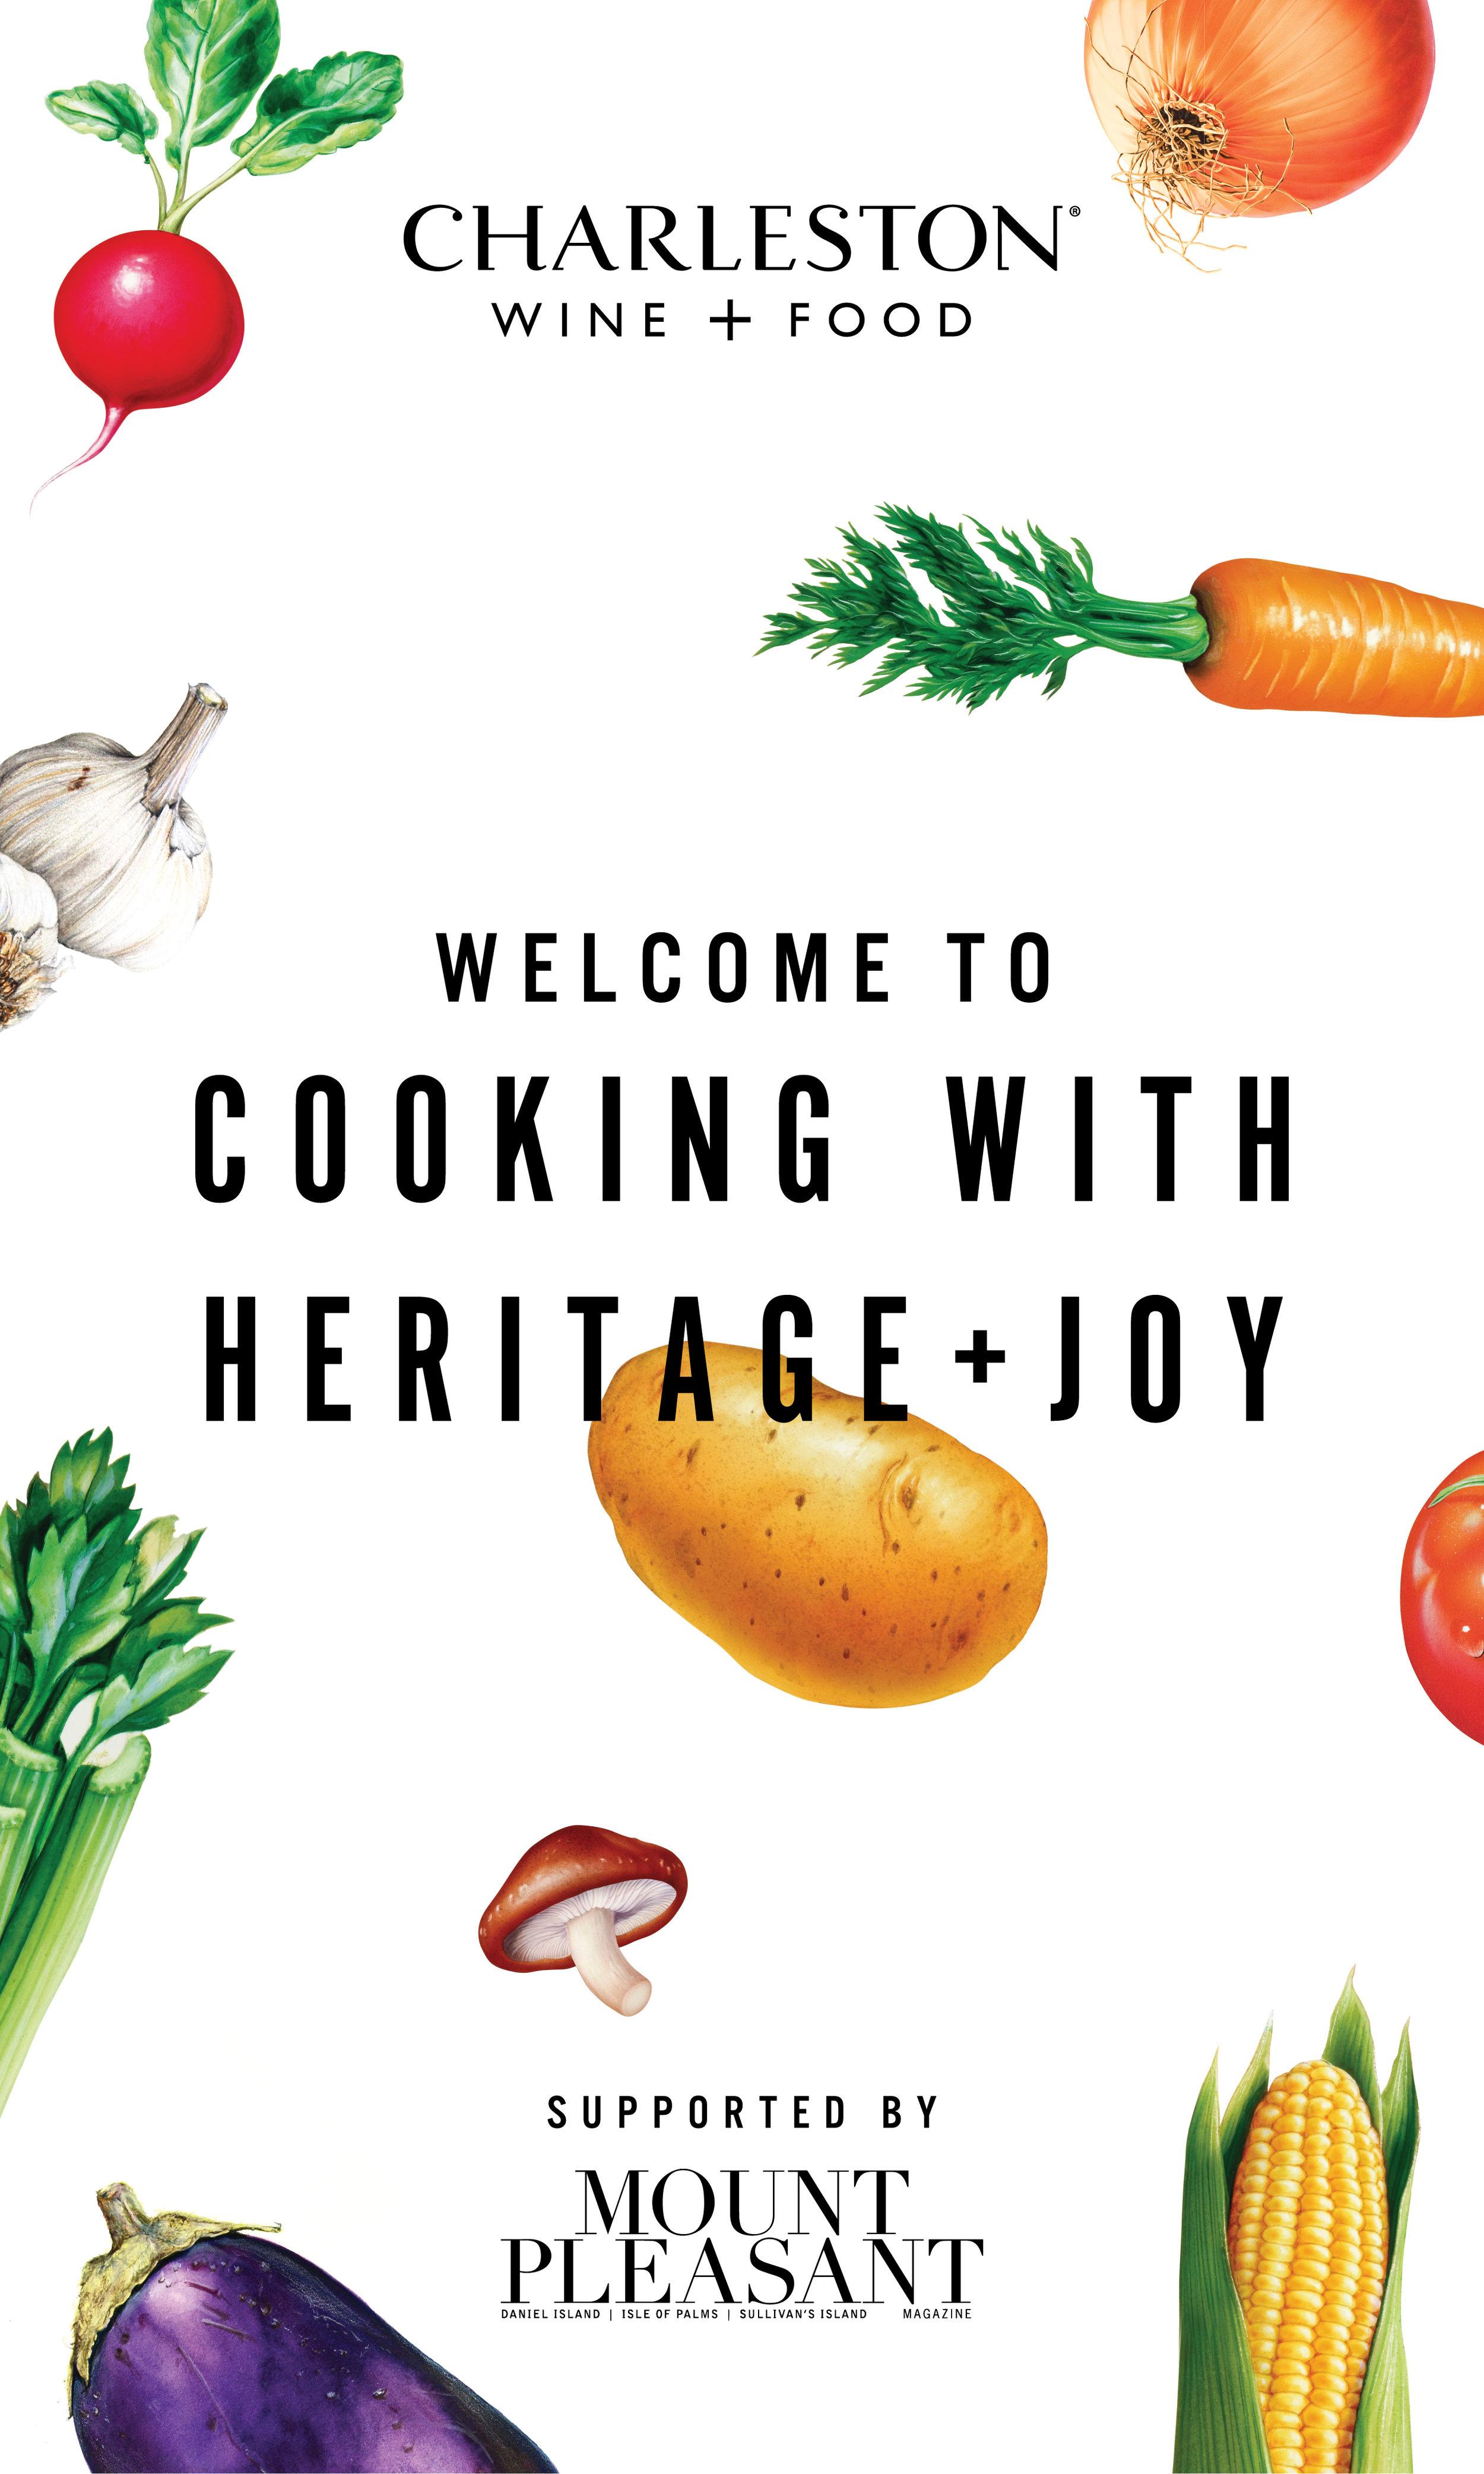 Cooking-With-Heritage-+-Joy.jpg